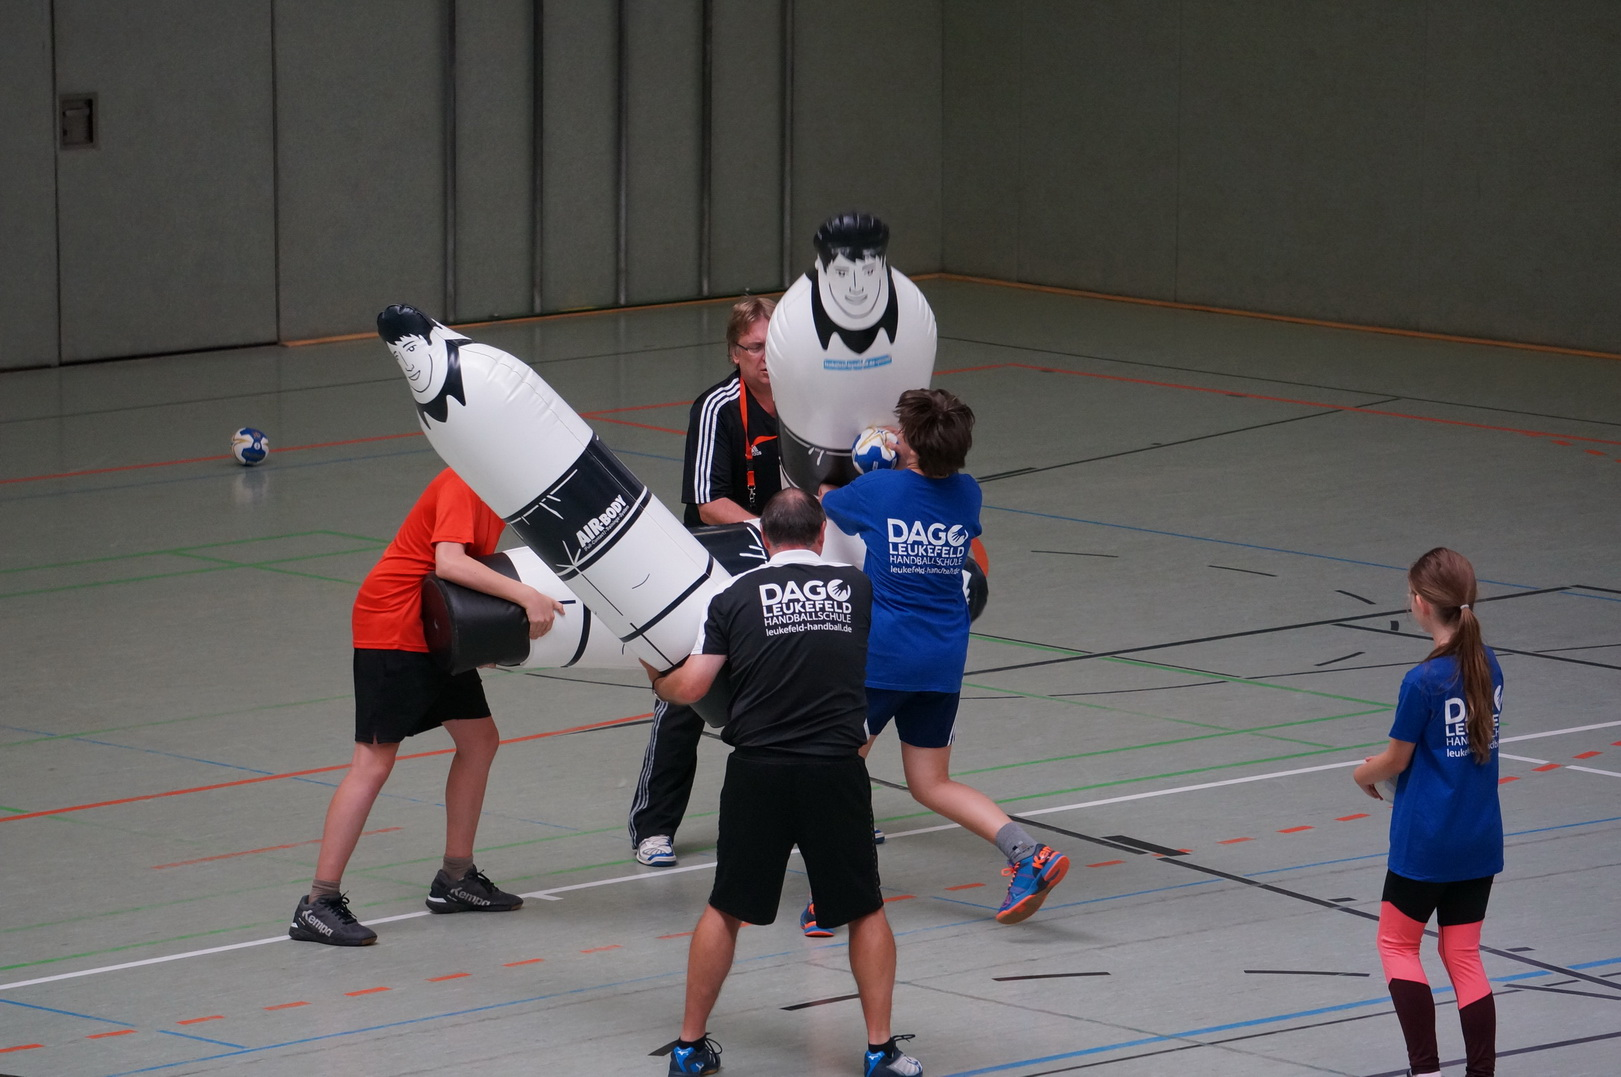 201808_Handballcamp_SDH_MG_263w